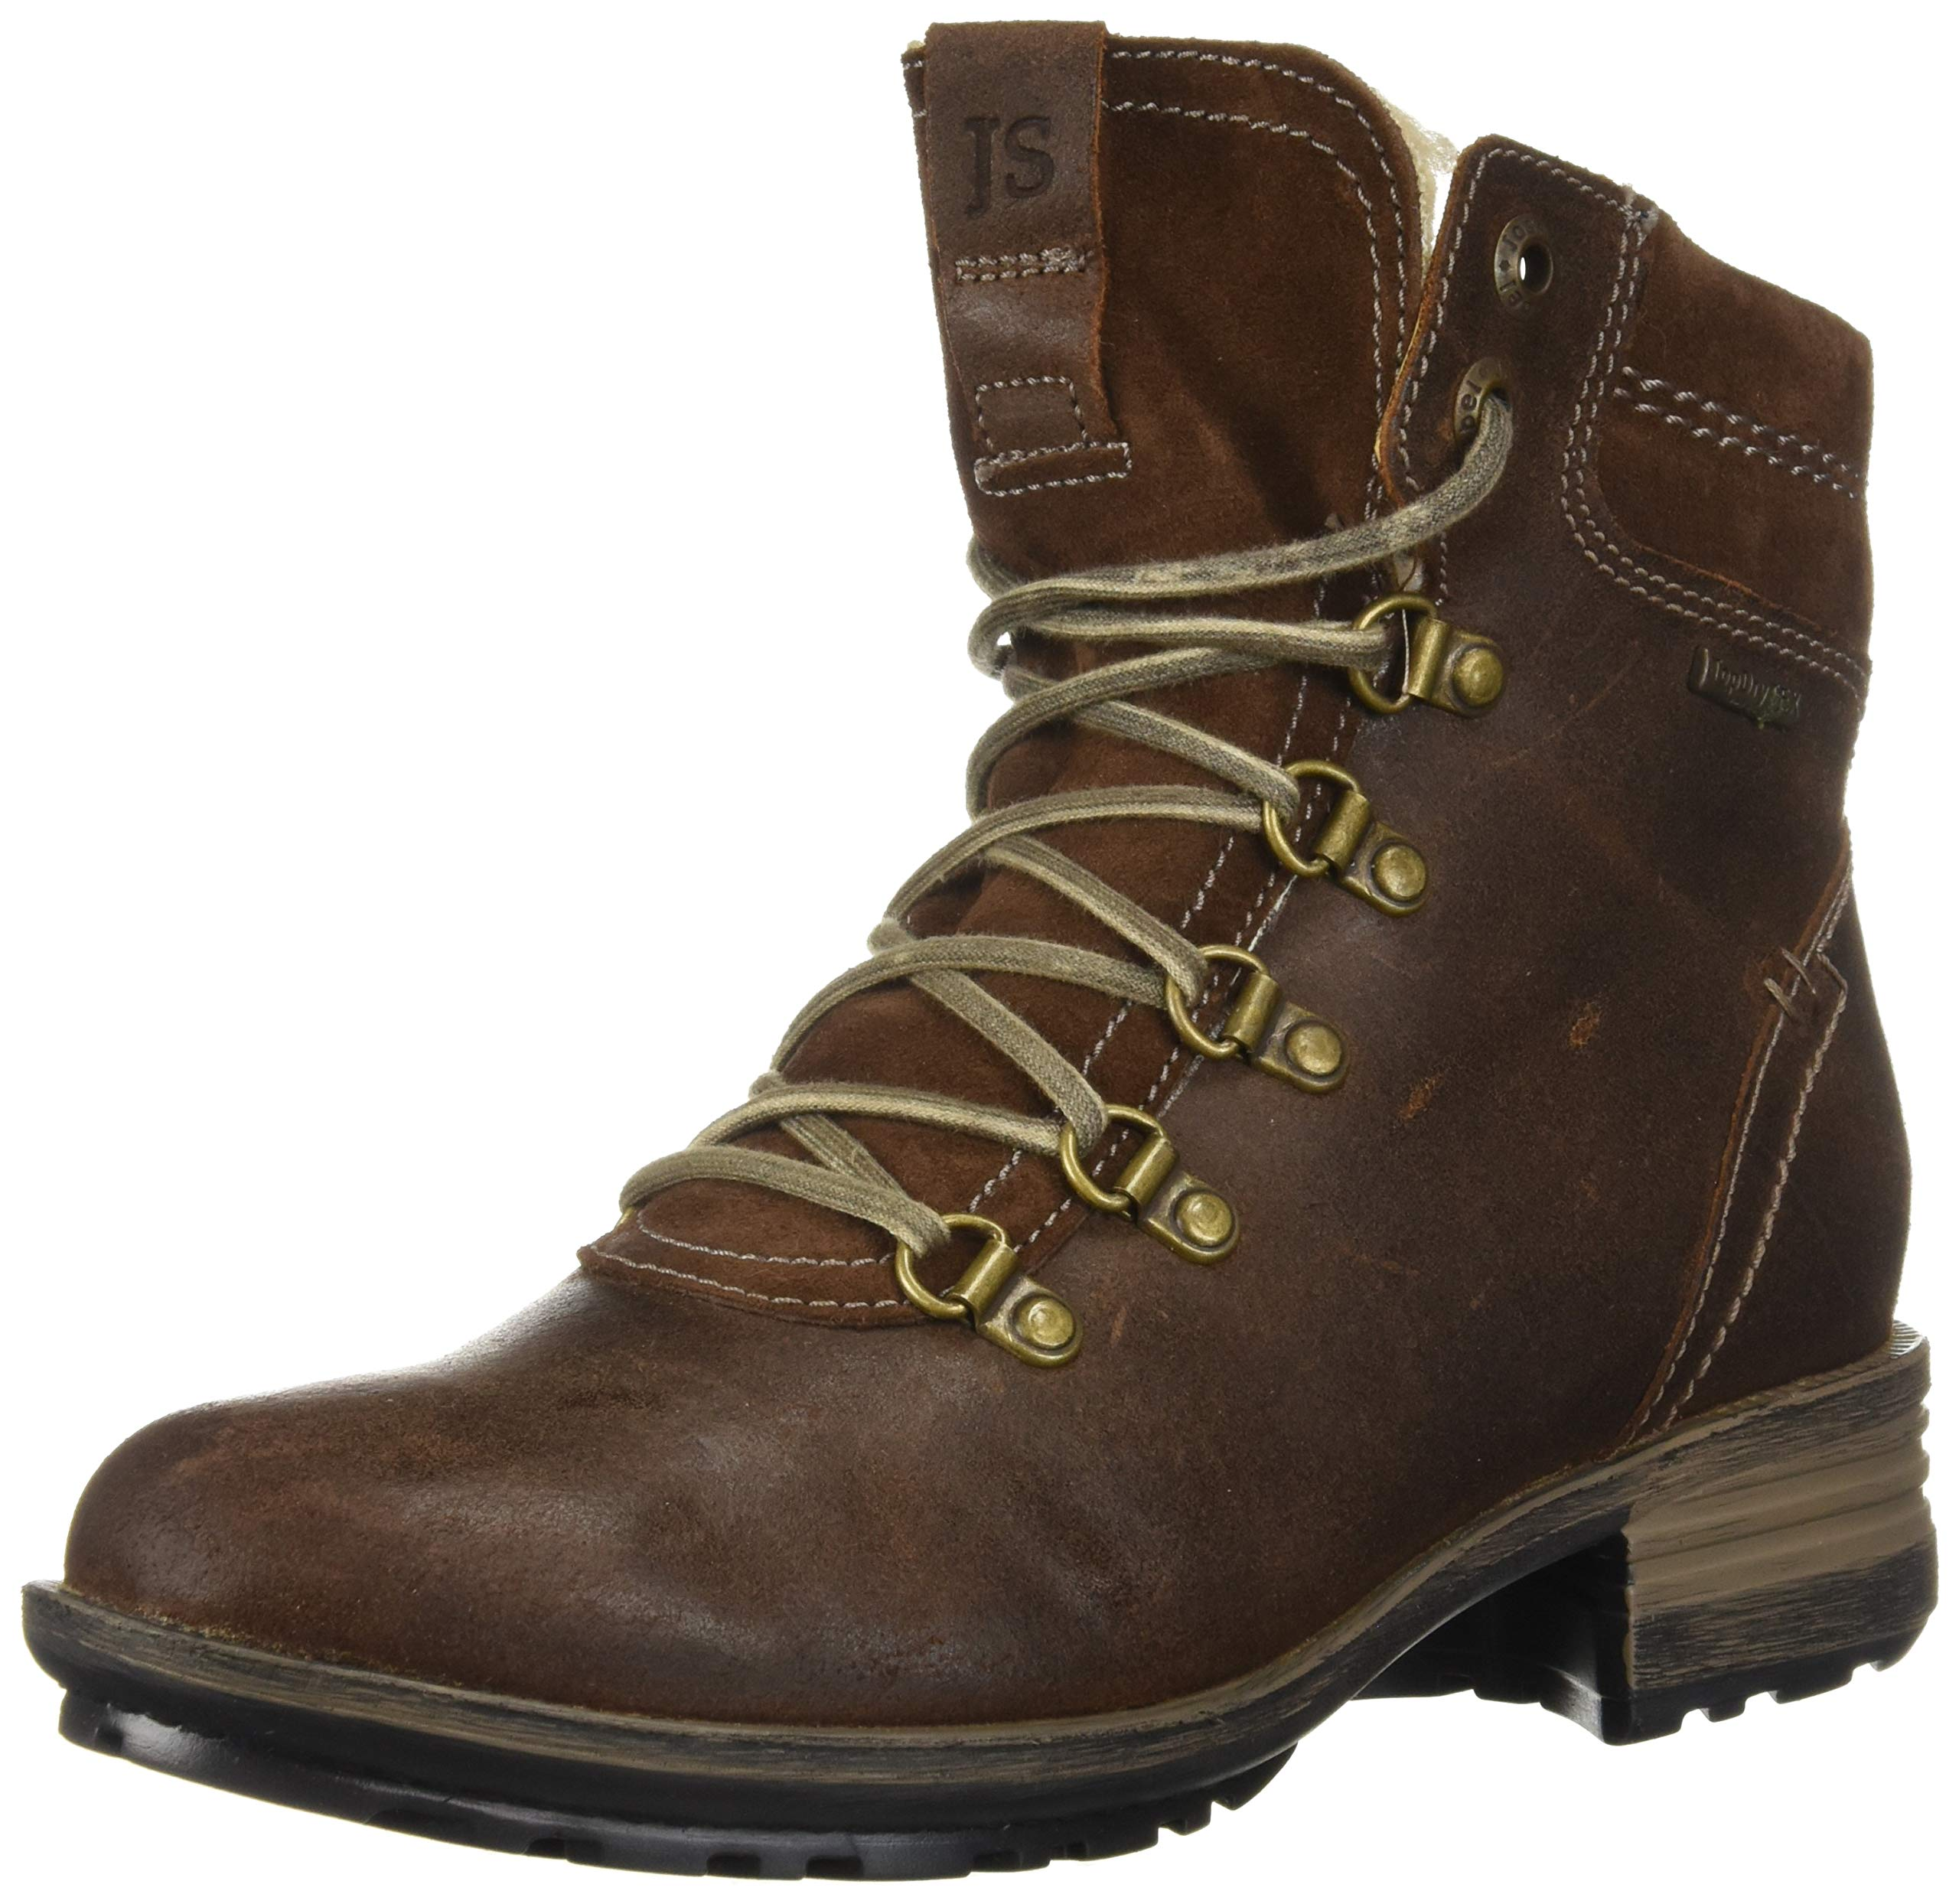 Josef Seibel Women's Sandra 66 Ankle Boot, Castagne, 39 Medium EU (8-8.5 US) by Josef Seibel